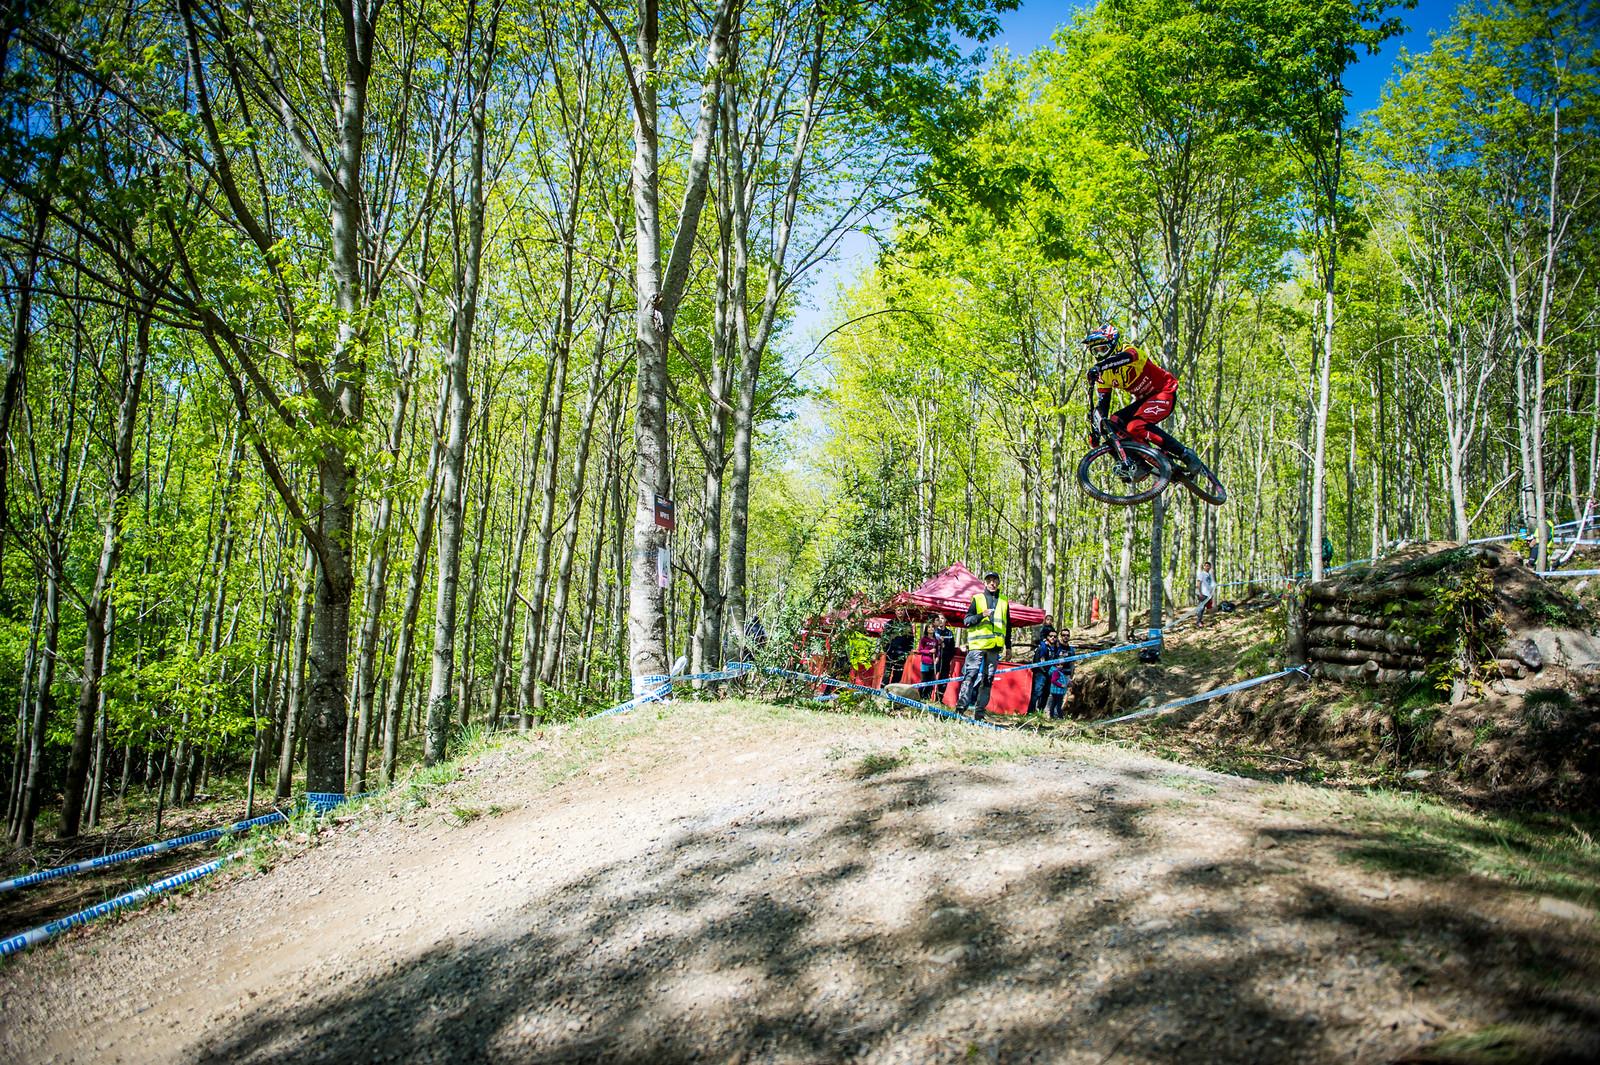 Sik Mik Scrub - iceman2058 - Mountain Biking Pictures - Vital MTB